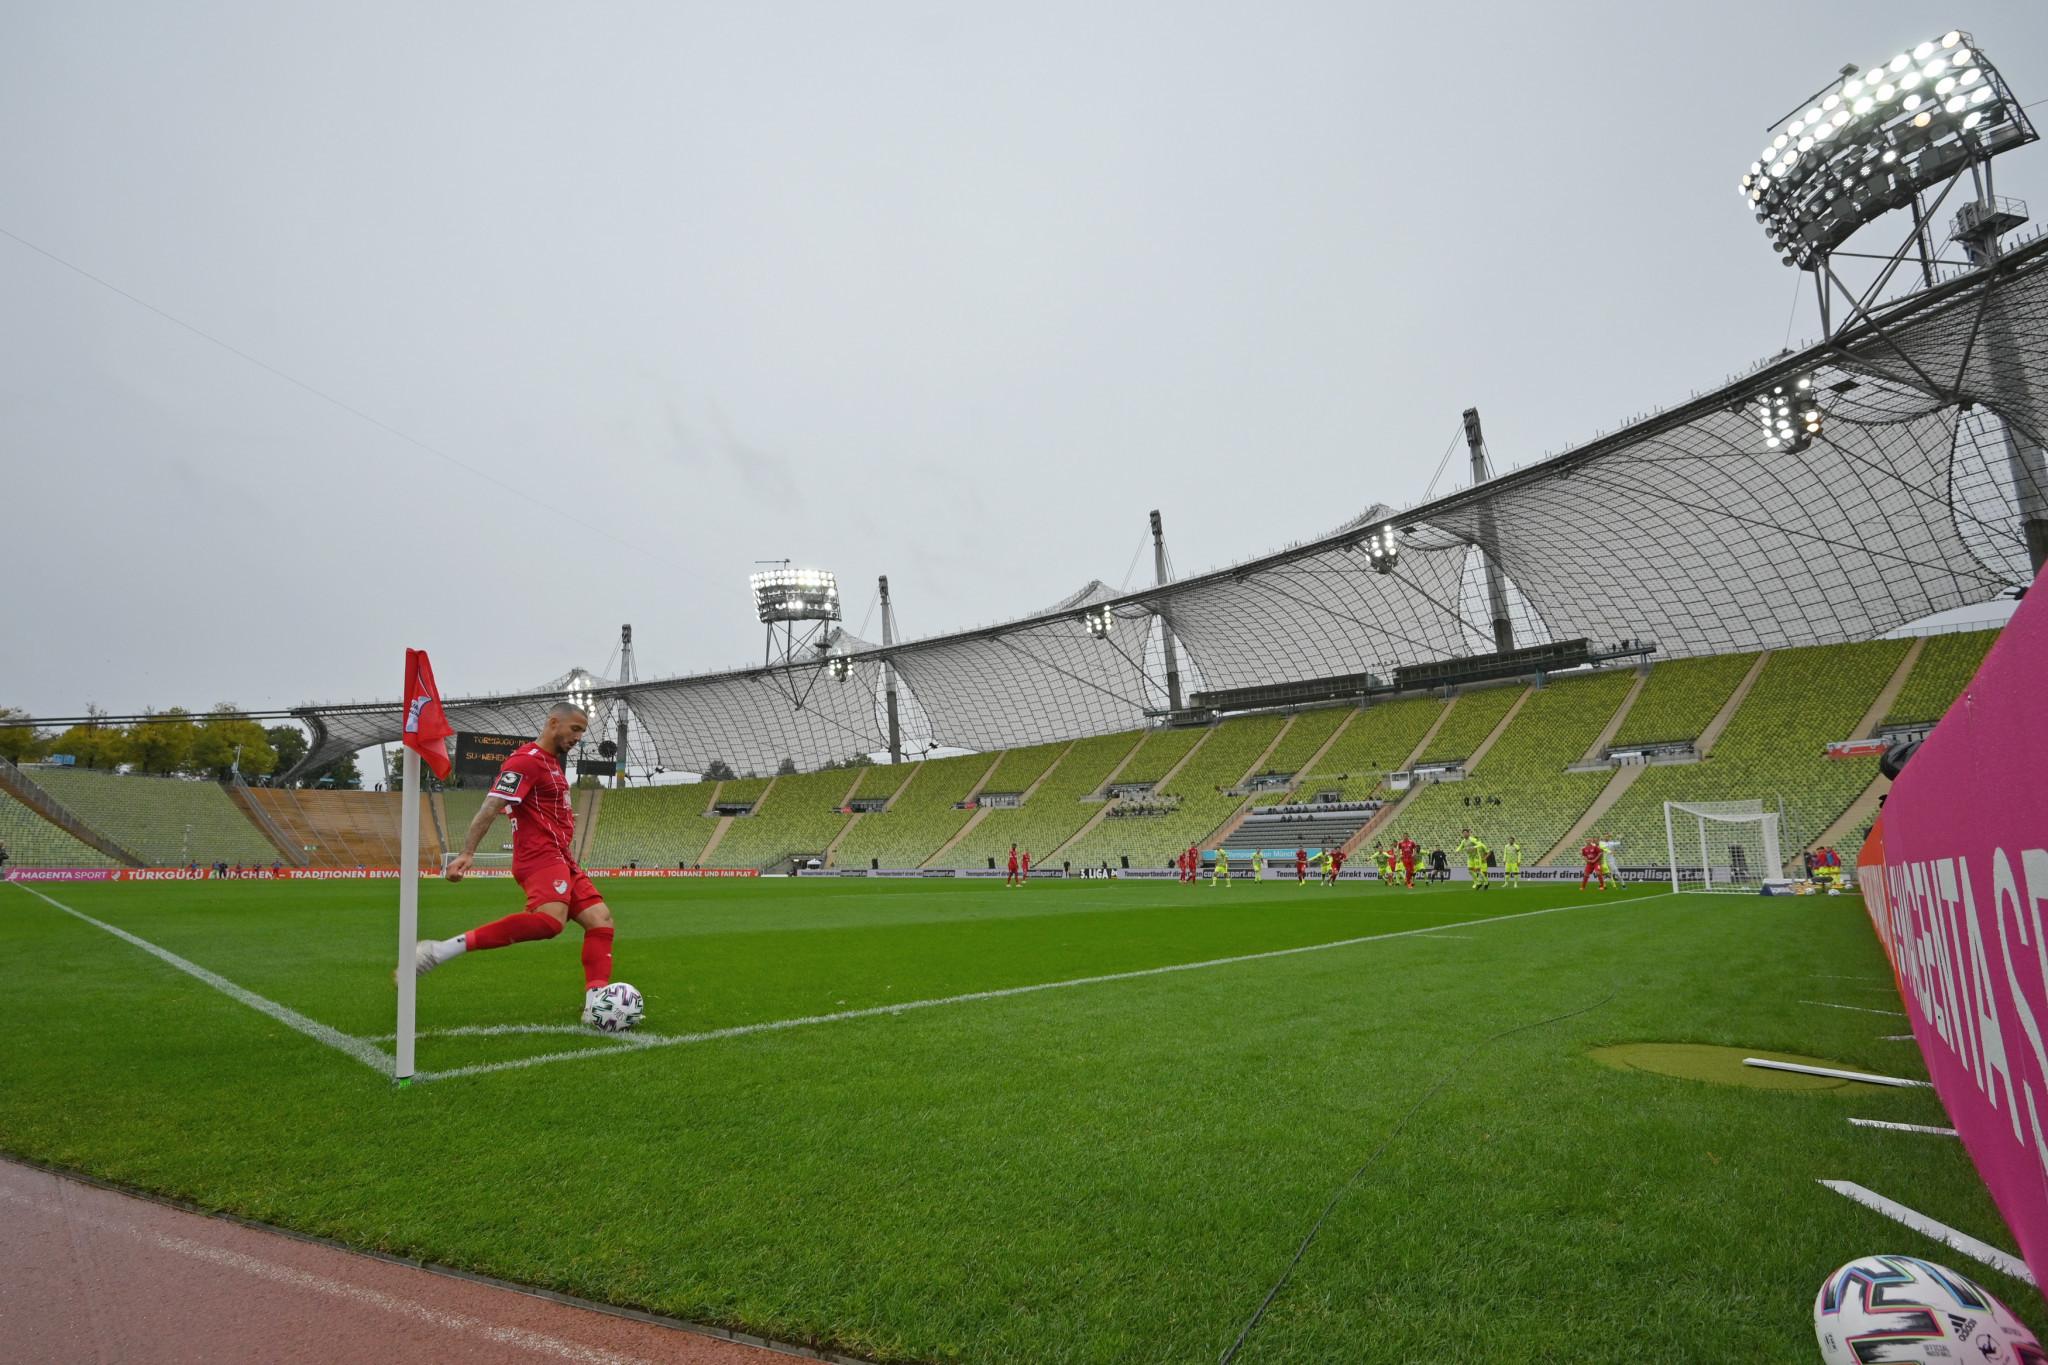 Football returns to Munich Olympic Stadium ahead of 2022 European Championships